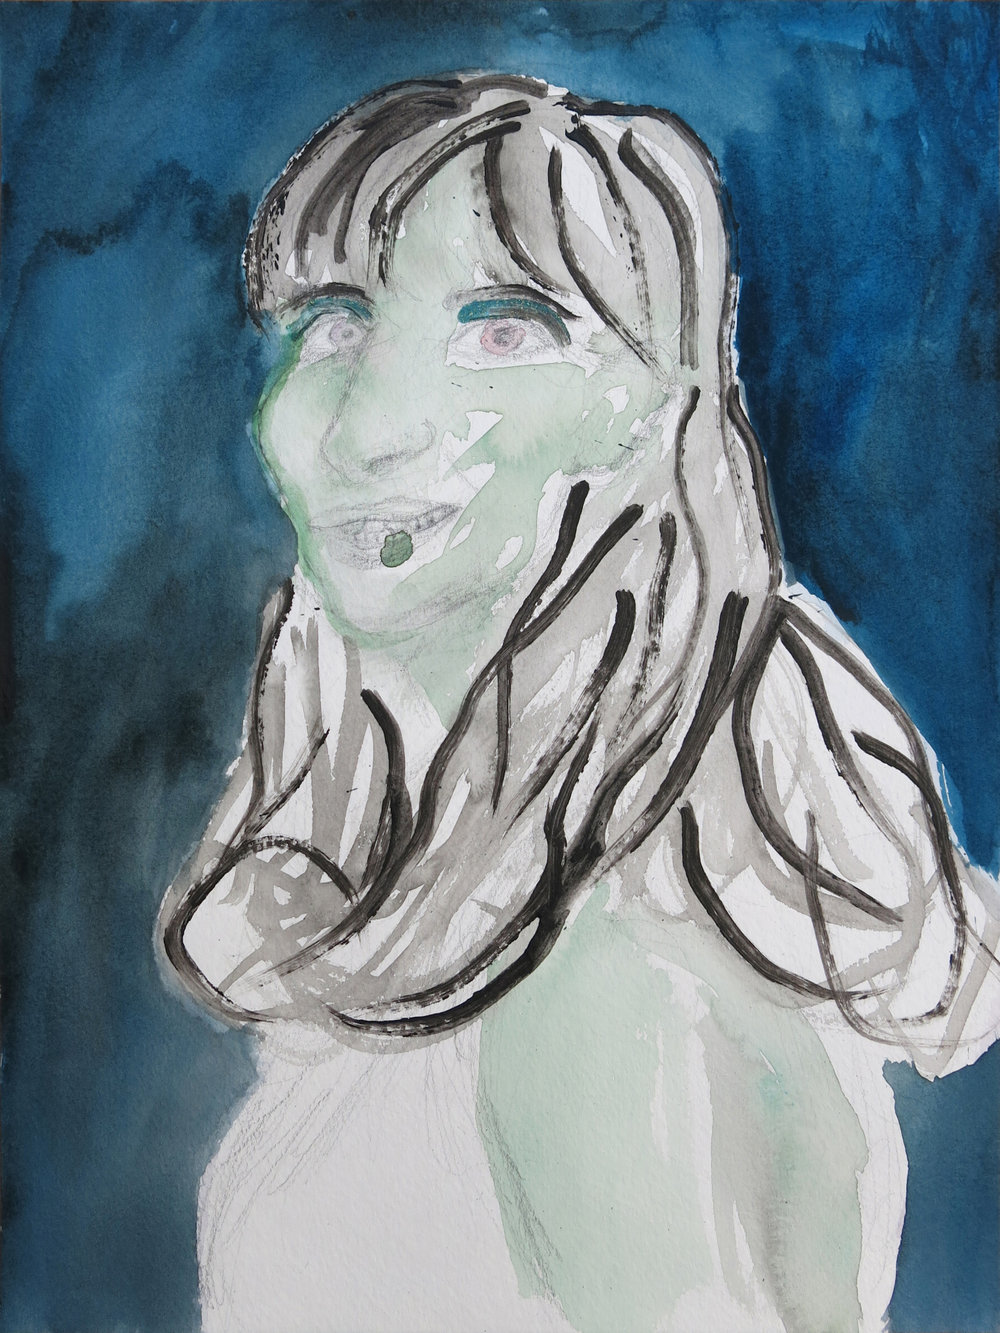 Barbra Streisand Portrait #188